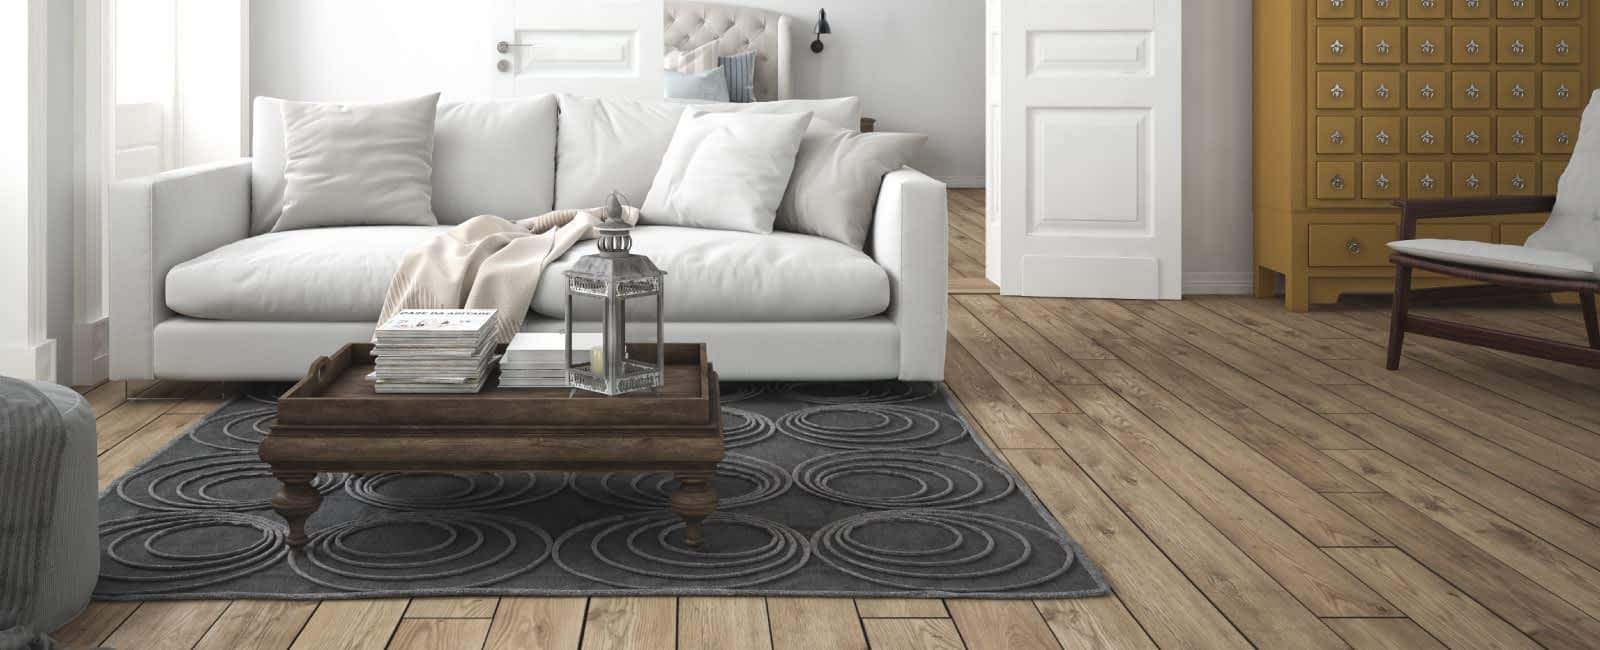 hope hardwood vinyls home flooring tile carpet floor slide and ceramic